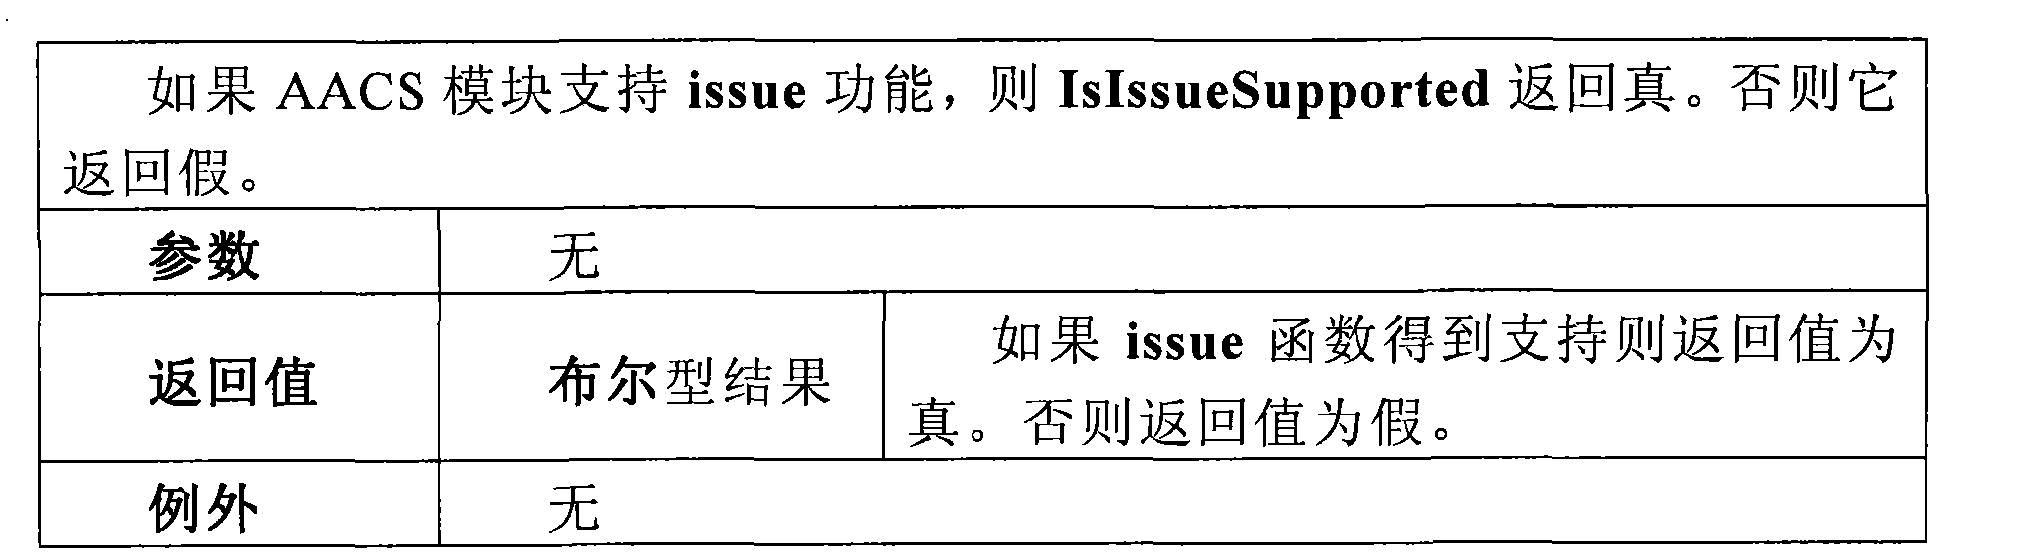 Figure CN102567676AD00401